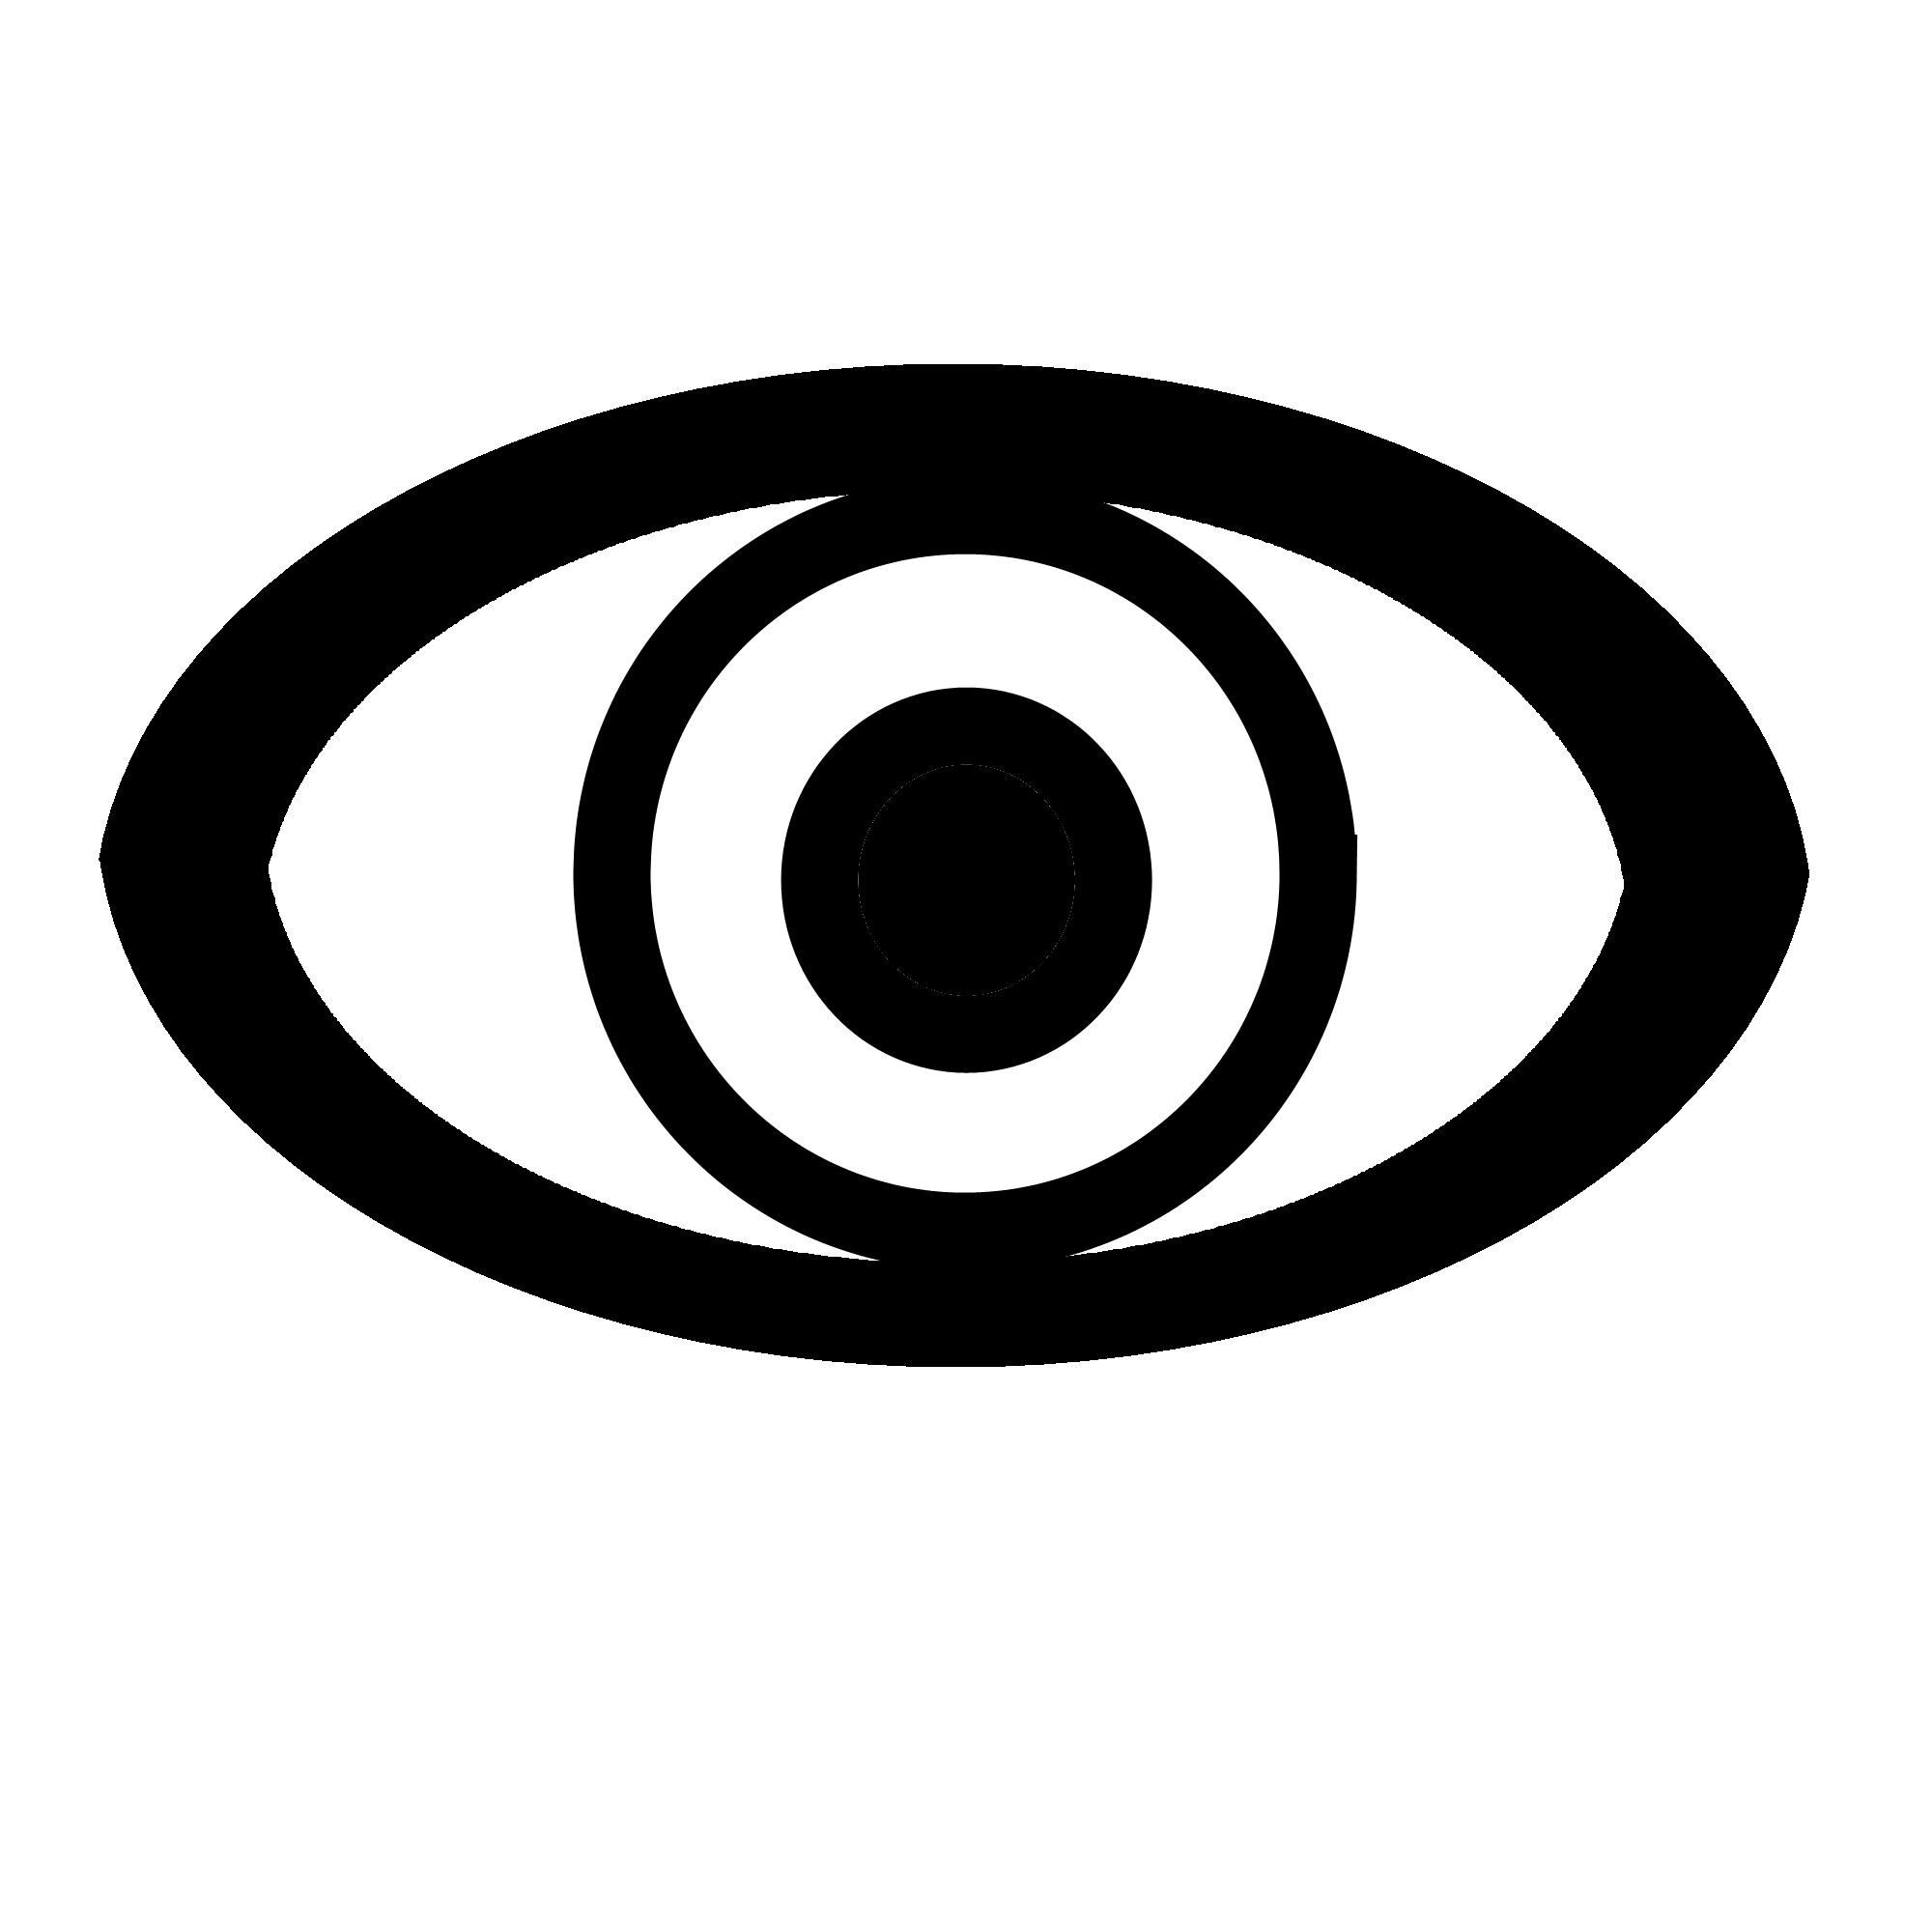 image logo oeil